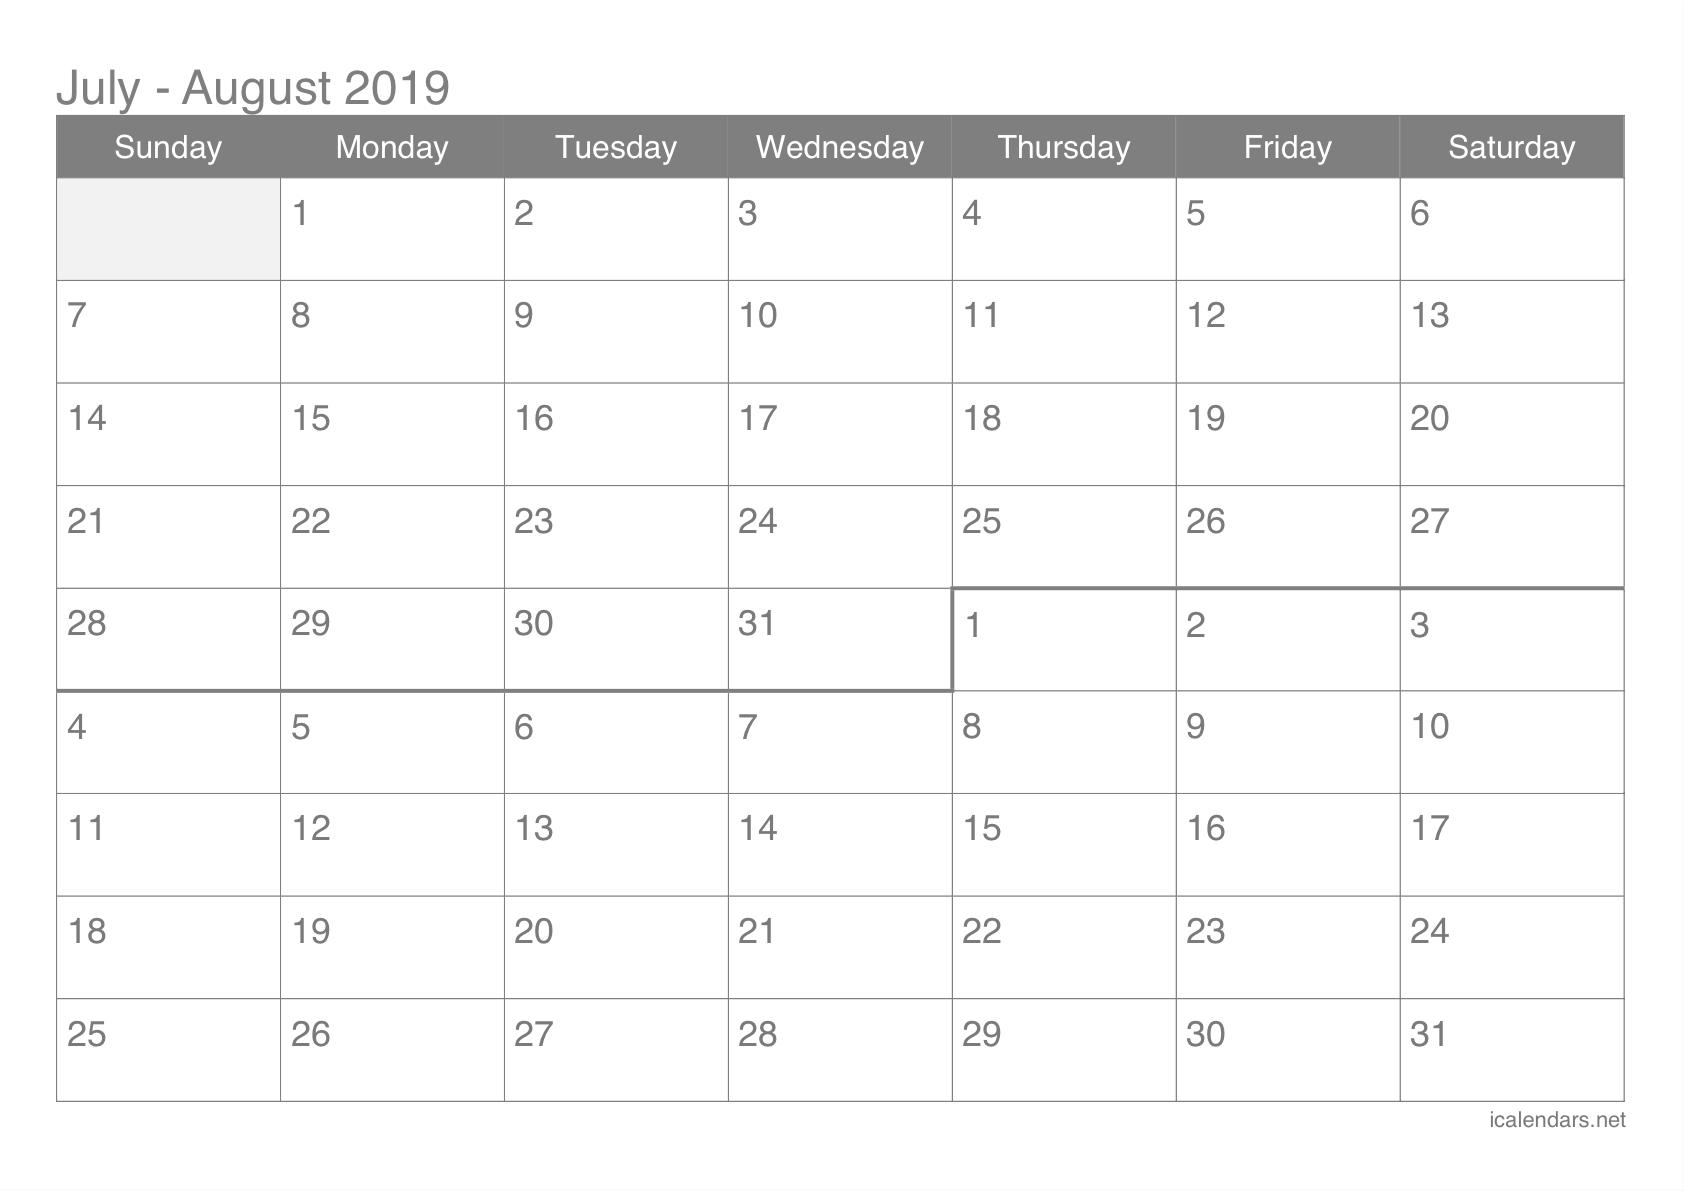 July And August 2019 Printable Calendar – Icalendars Calendar 0F 2019